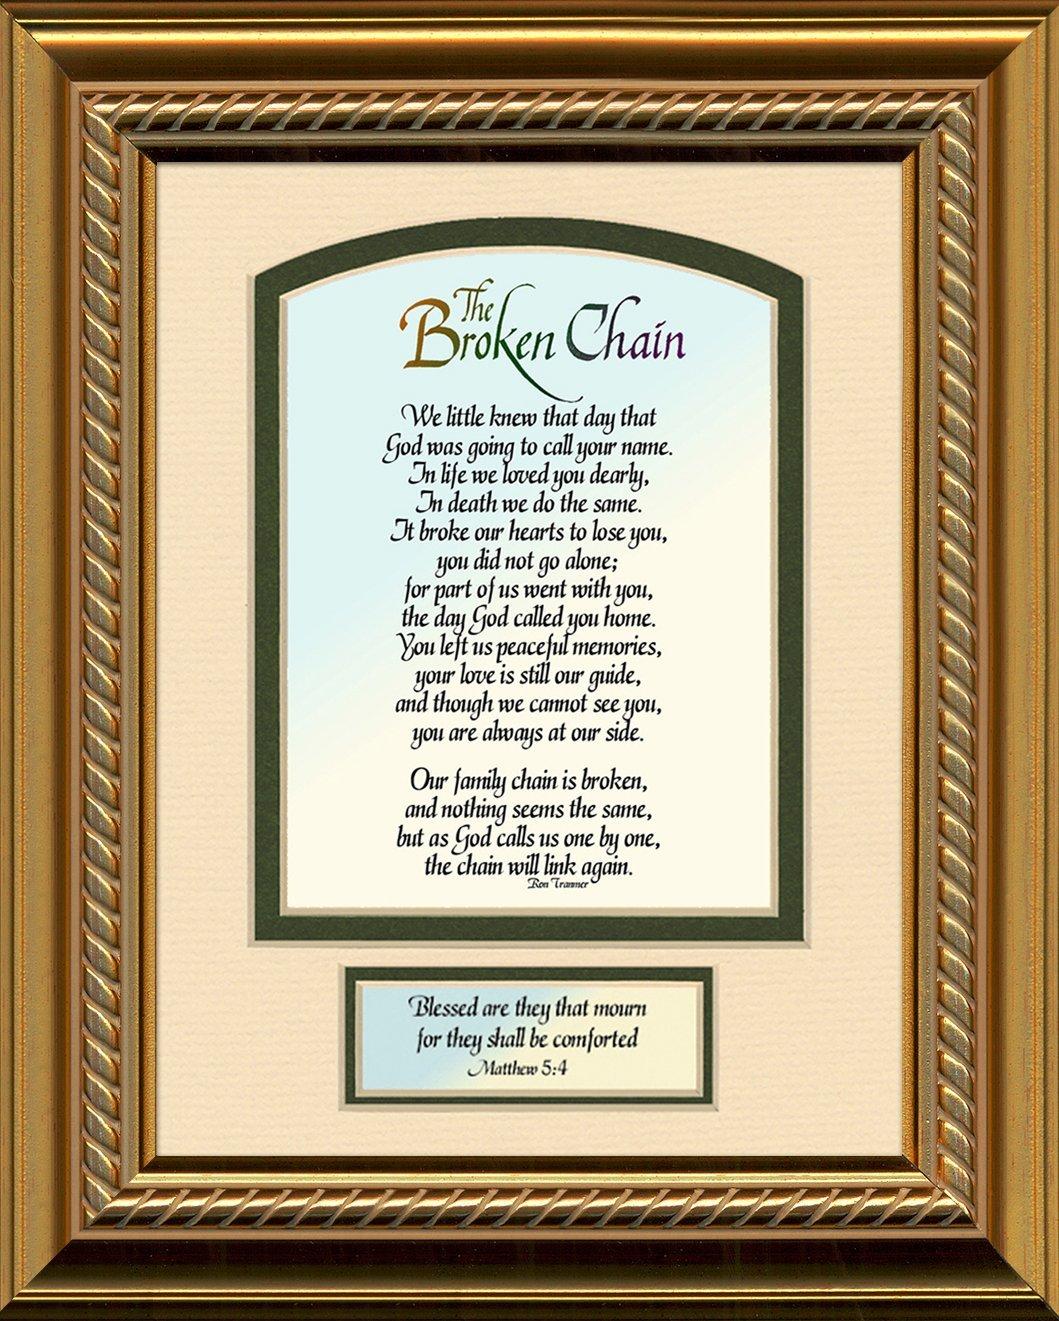 Buy Sympathy Poem Broken Chain With Scripture Matthew 1128 Photo